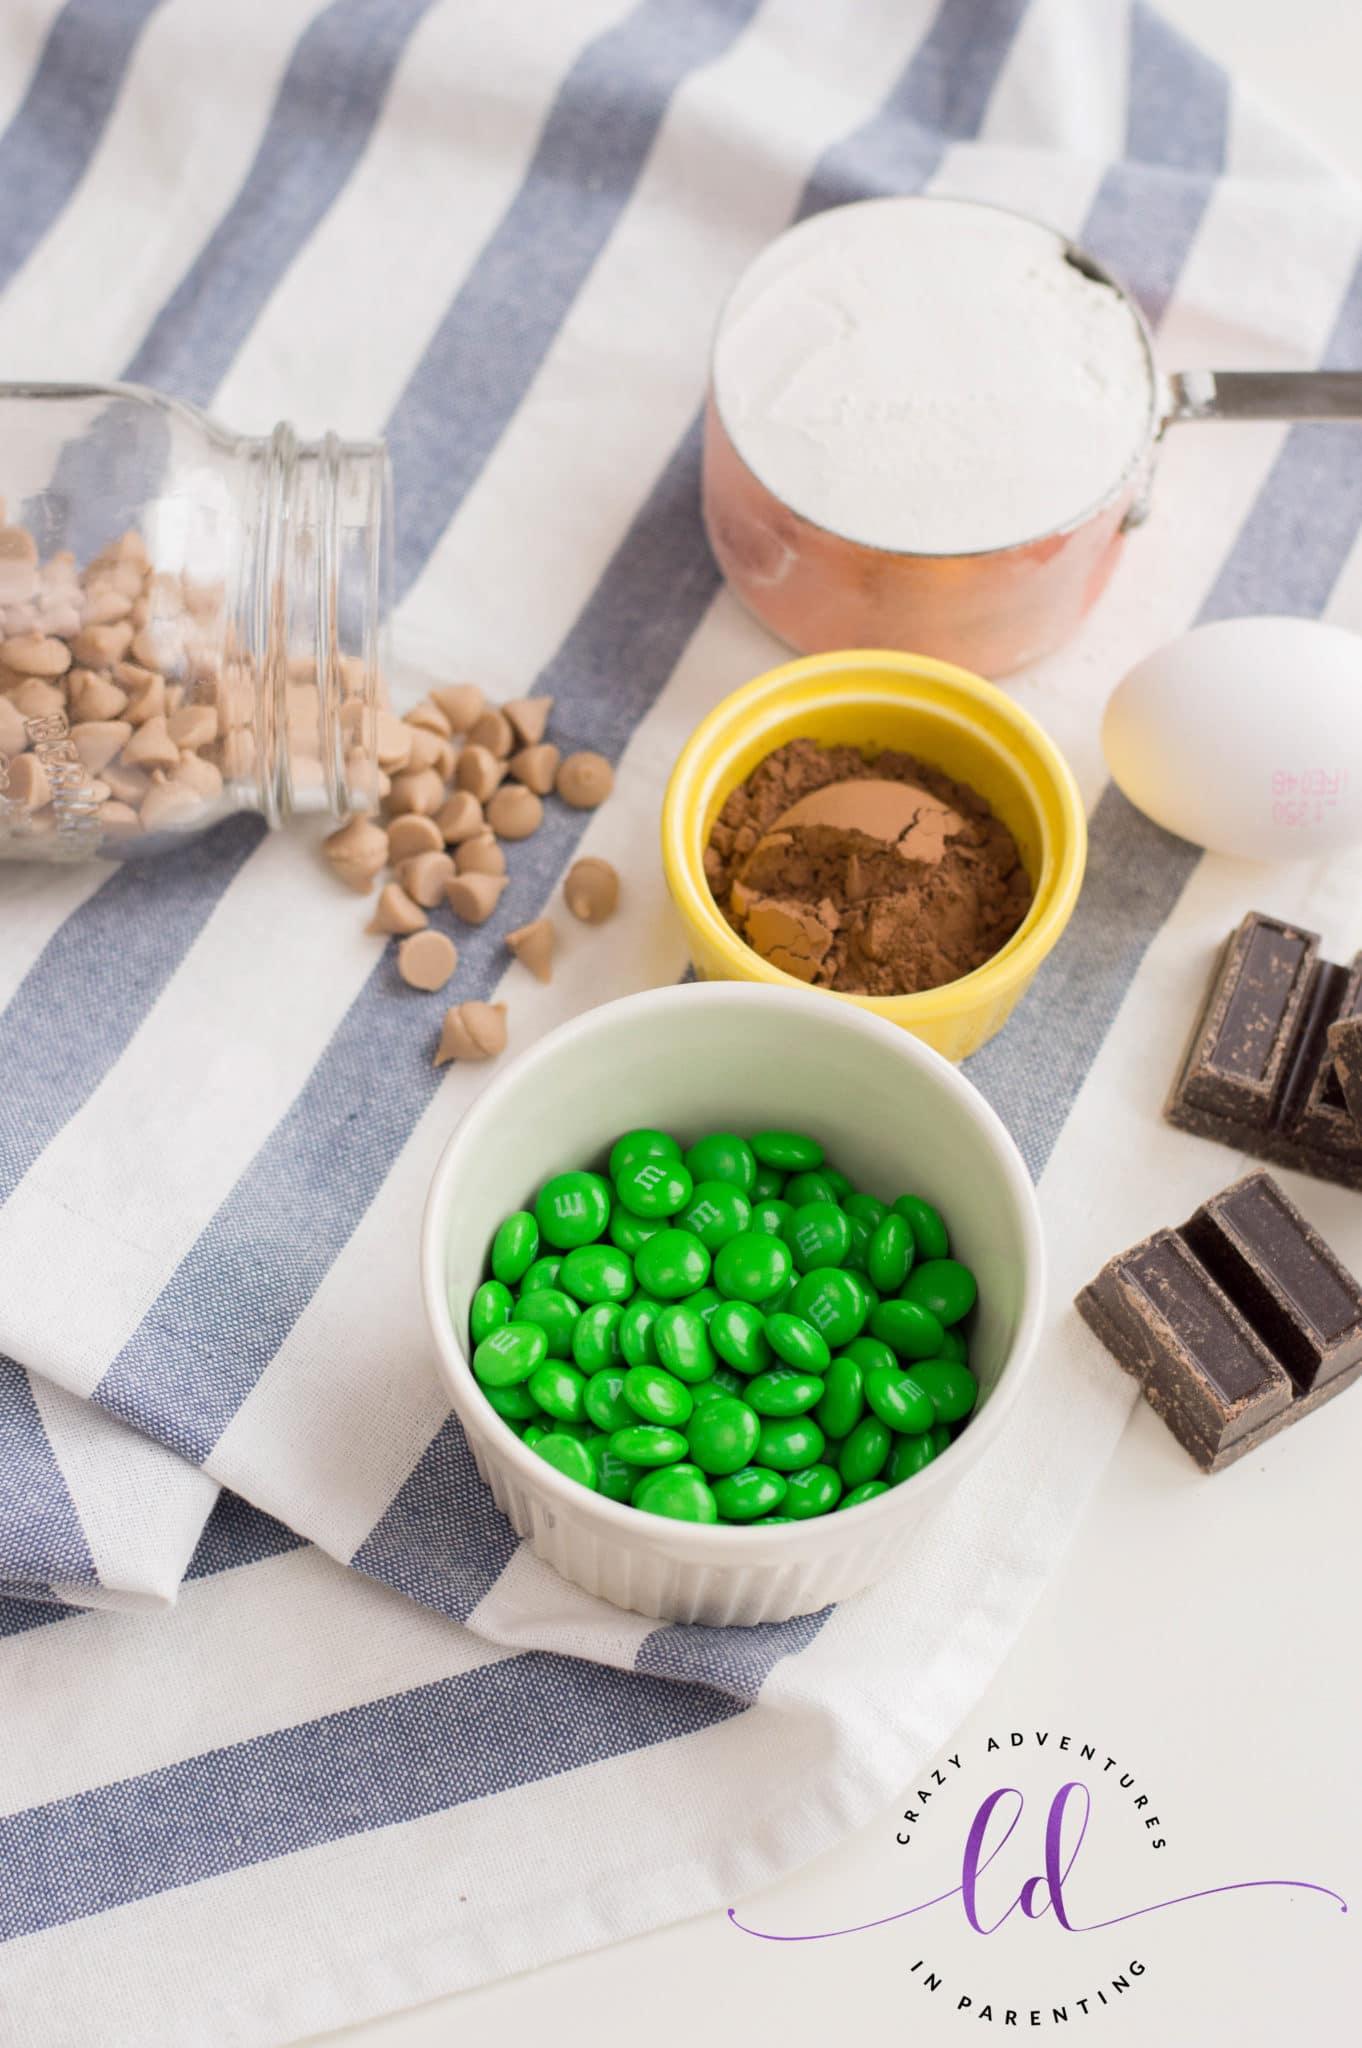 Ingredients Needed to Make St Patricks Day Chocolate Cookies